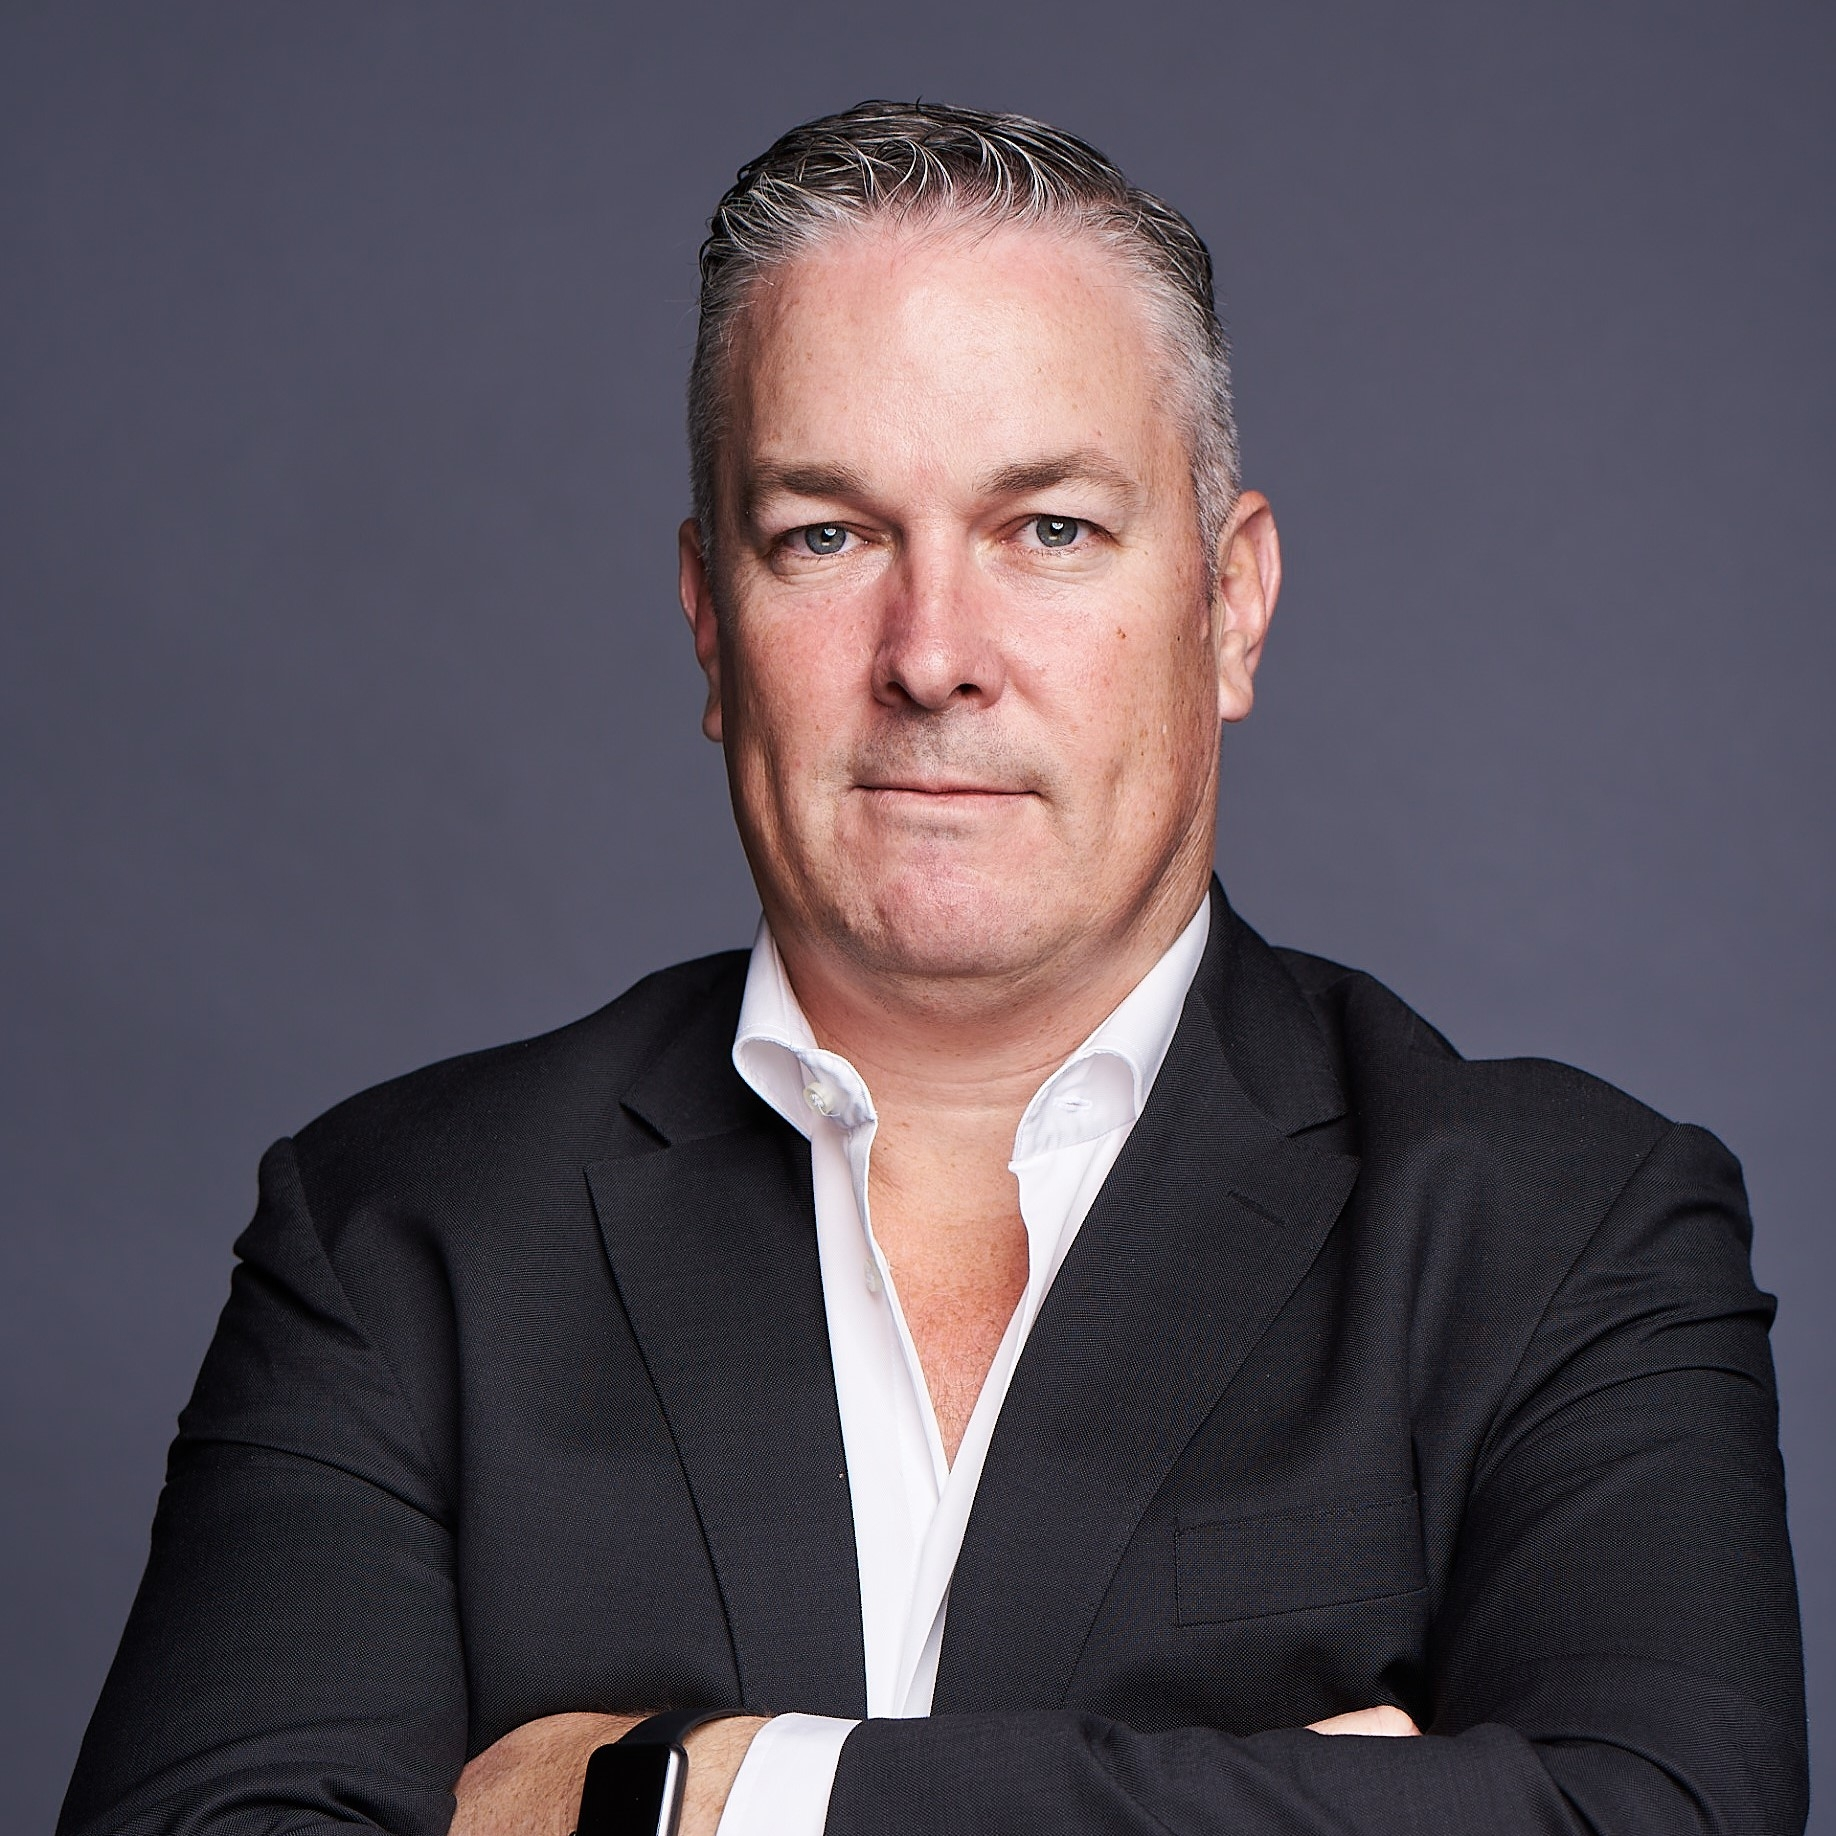 Chairman: Luke McCormack